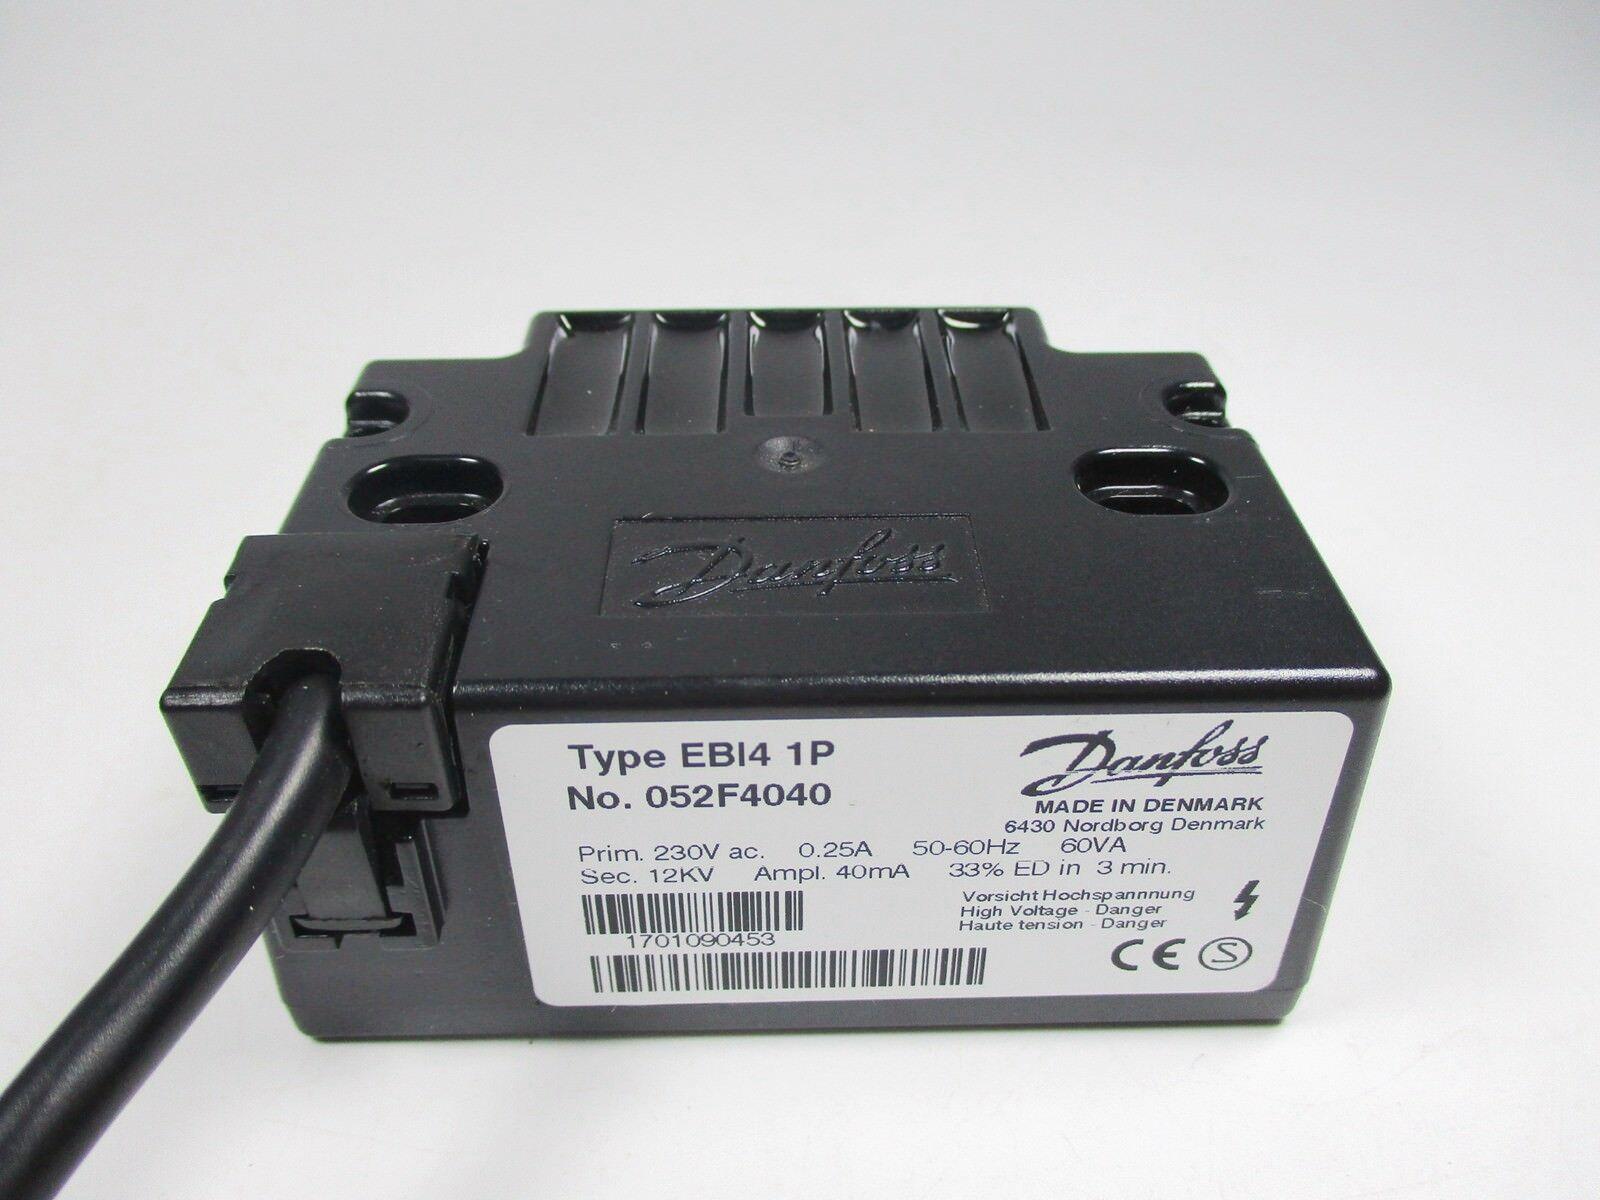 1PC New EBI4 1P No.052F4040 For Danfoss Ignition transformer For burner